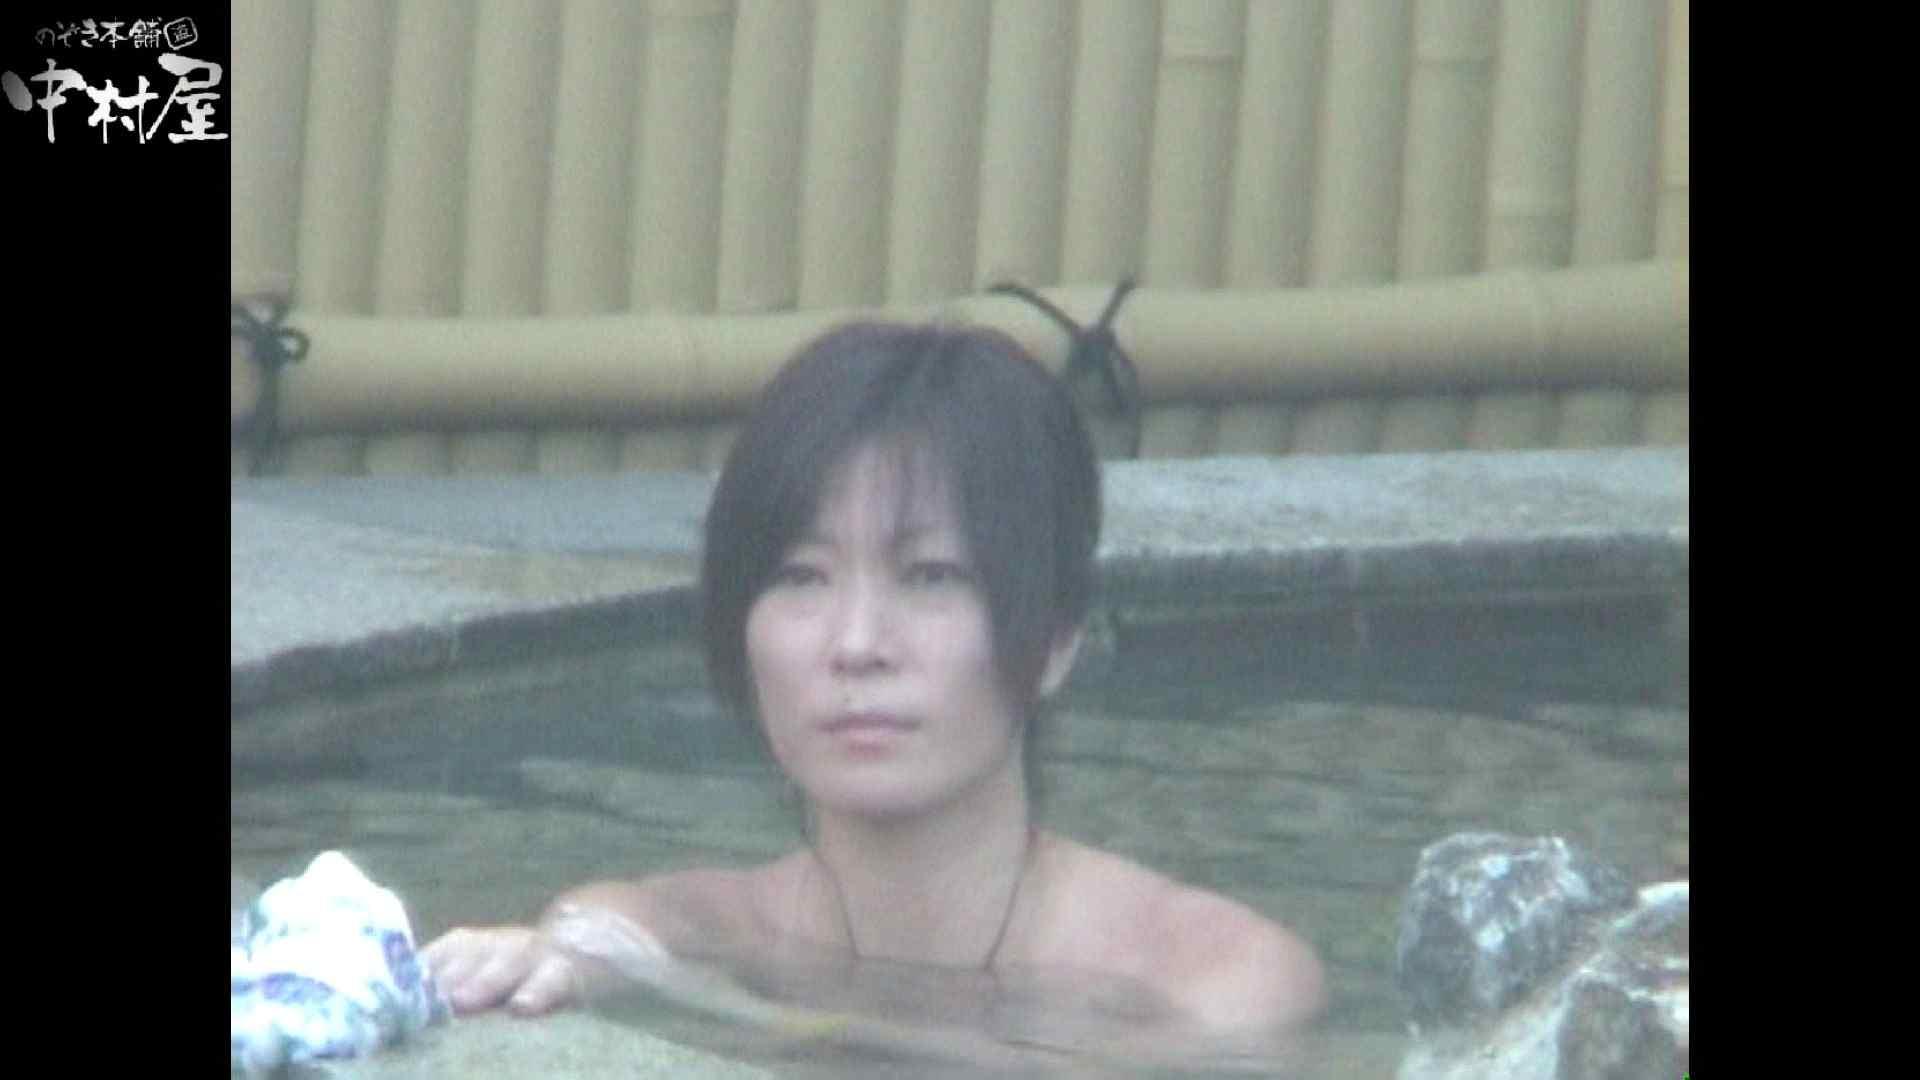 Aquaな露天風呂Vol.972 露天   OLセックス  80画像 67